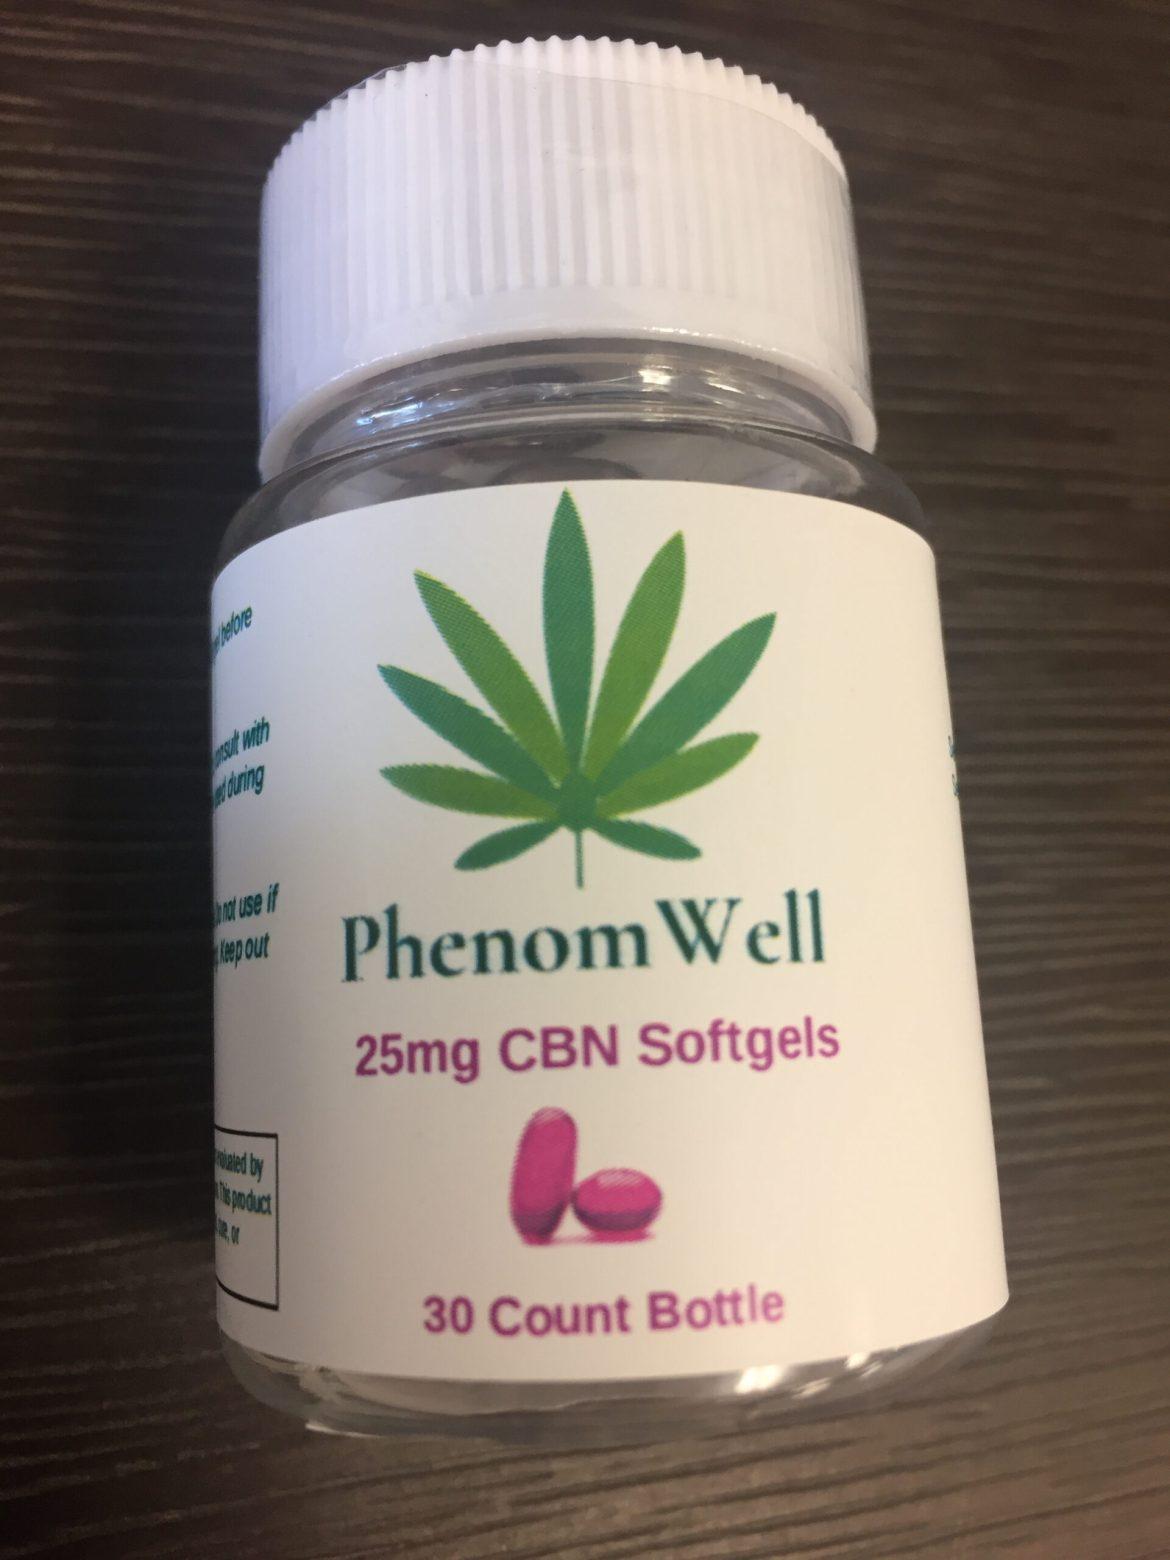 PhenomWell 25mg CBN Softgels